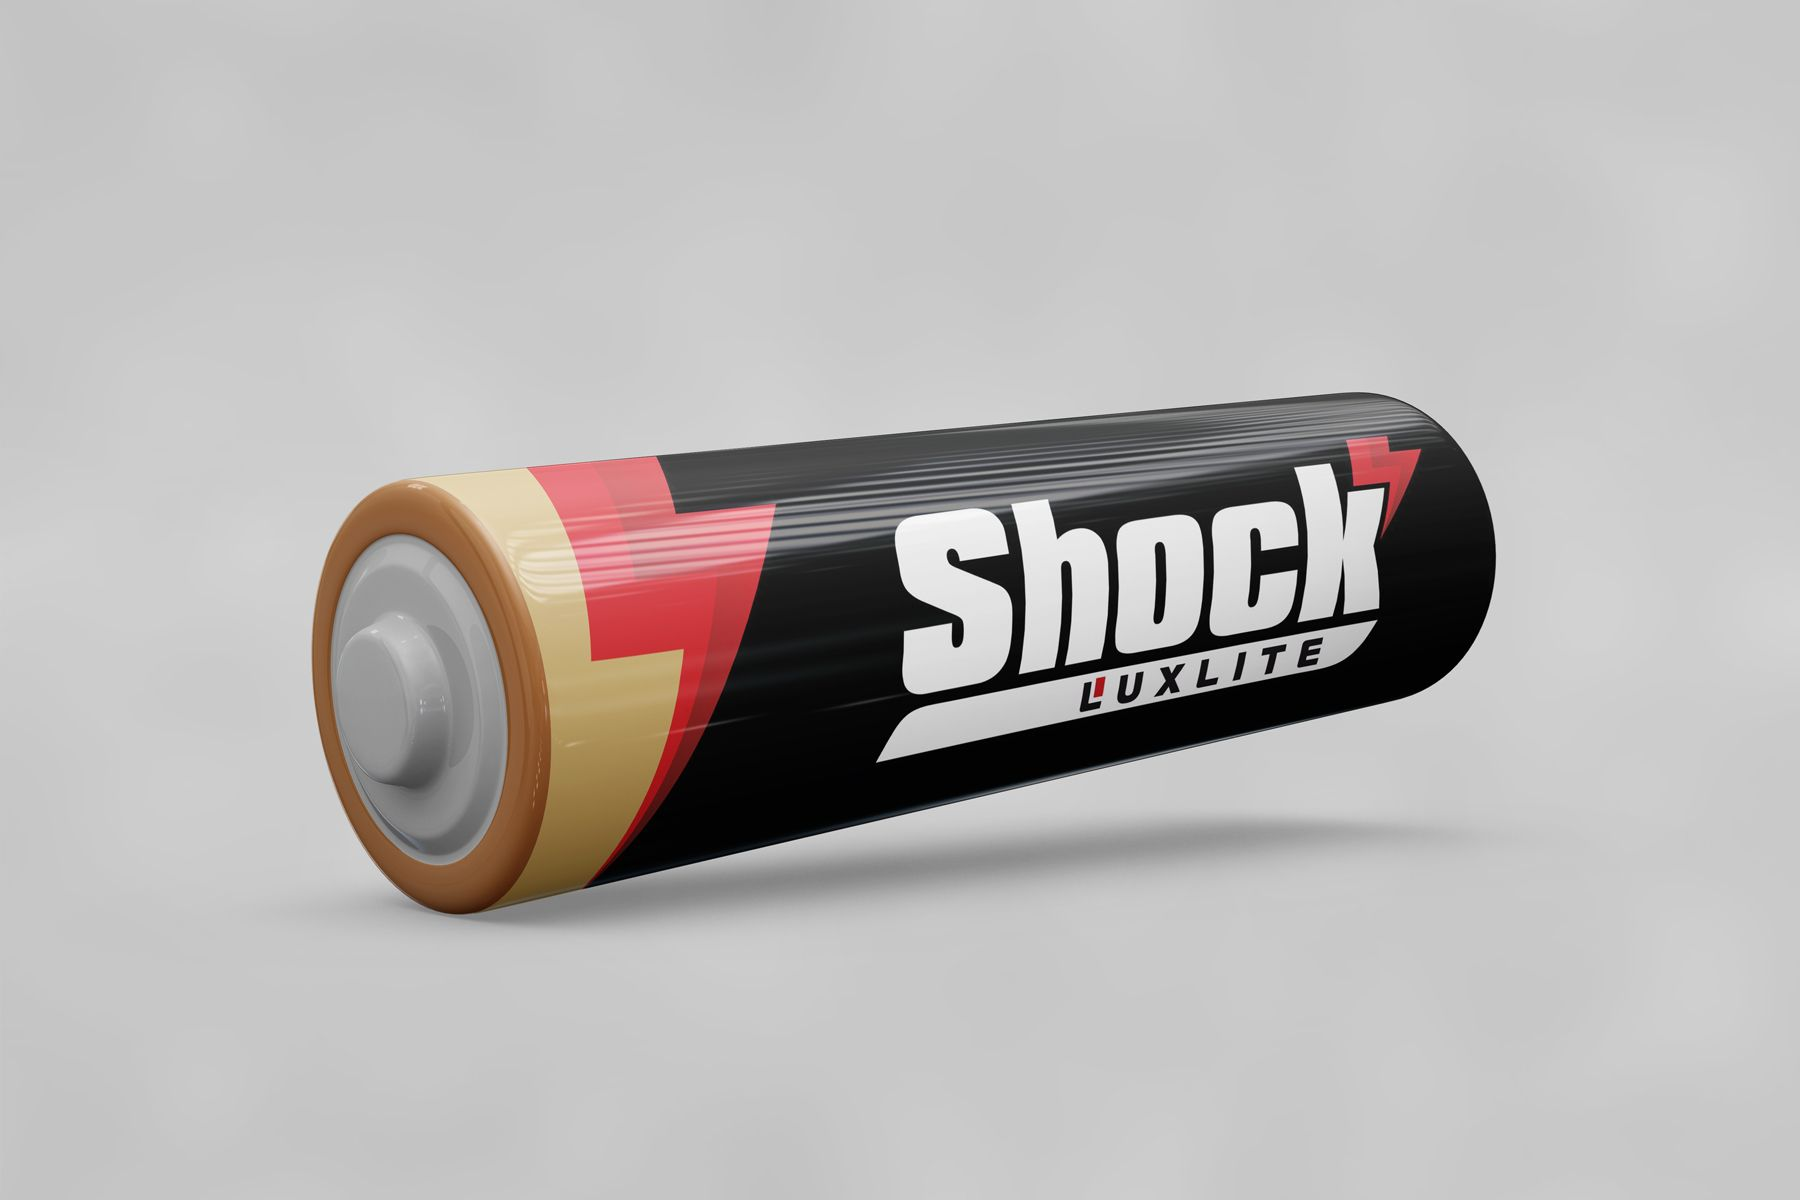 Логотип для батареек LUXLITE SHOCK - дизайнер M_Diz